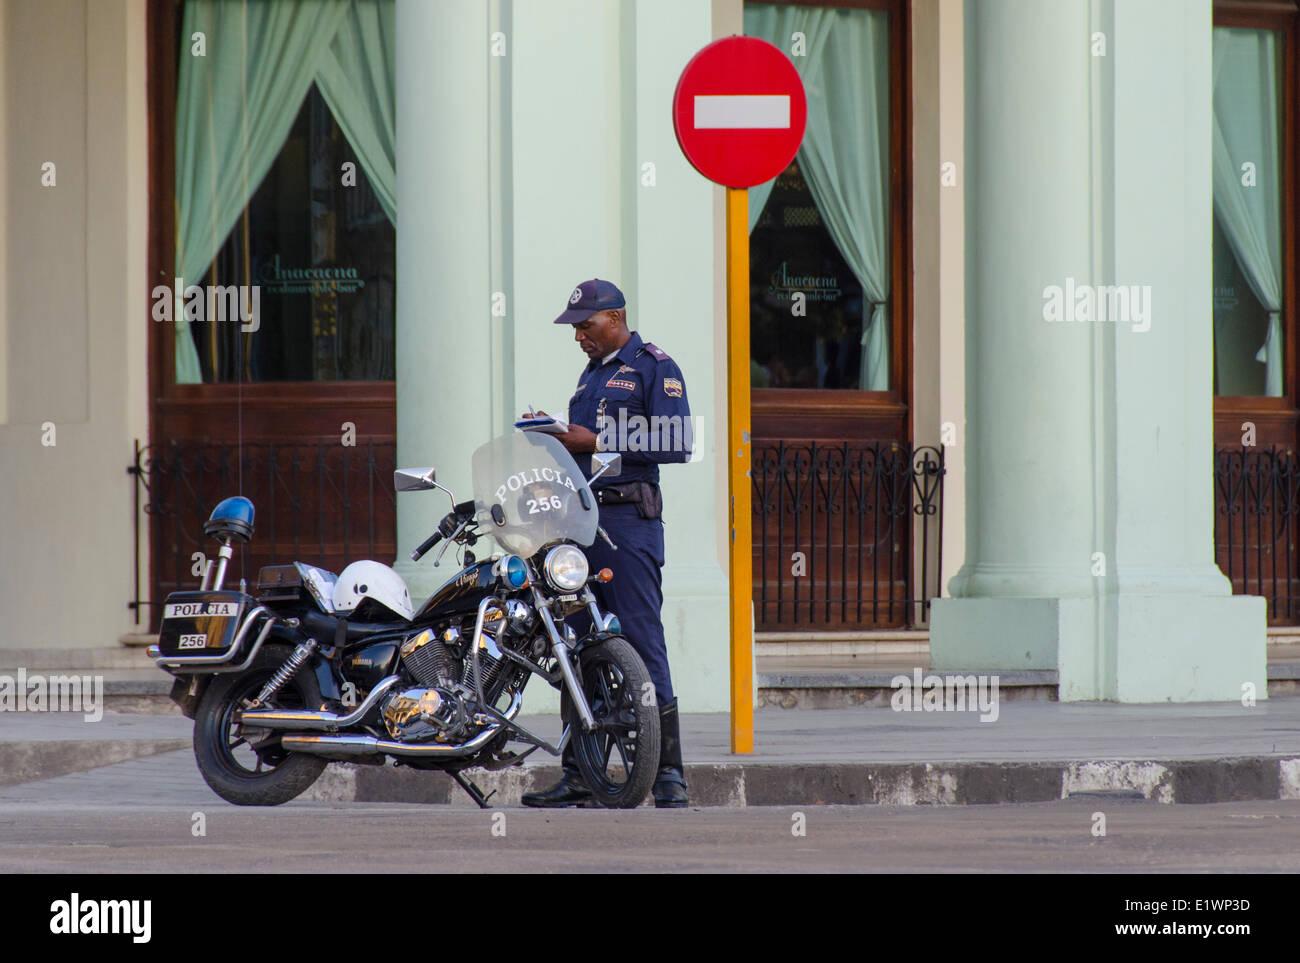 Motorcycle Policeman, Havana, Cuba - Stock Image